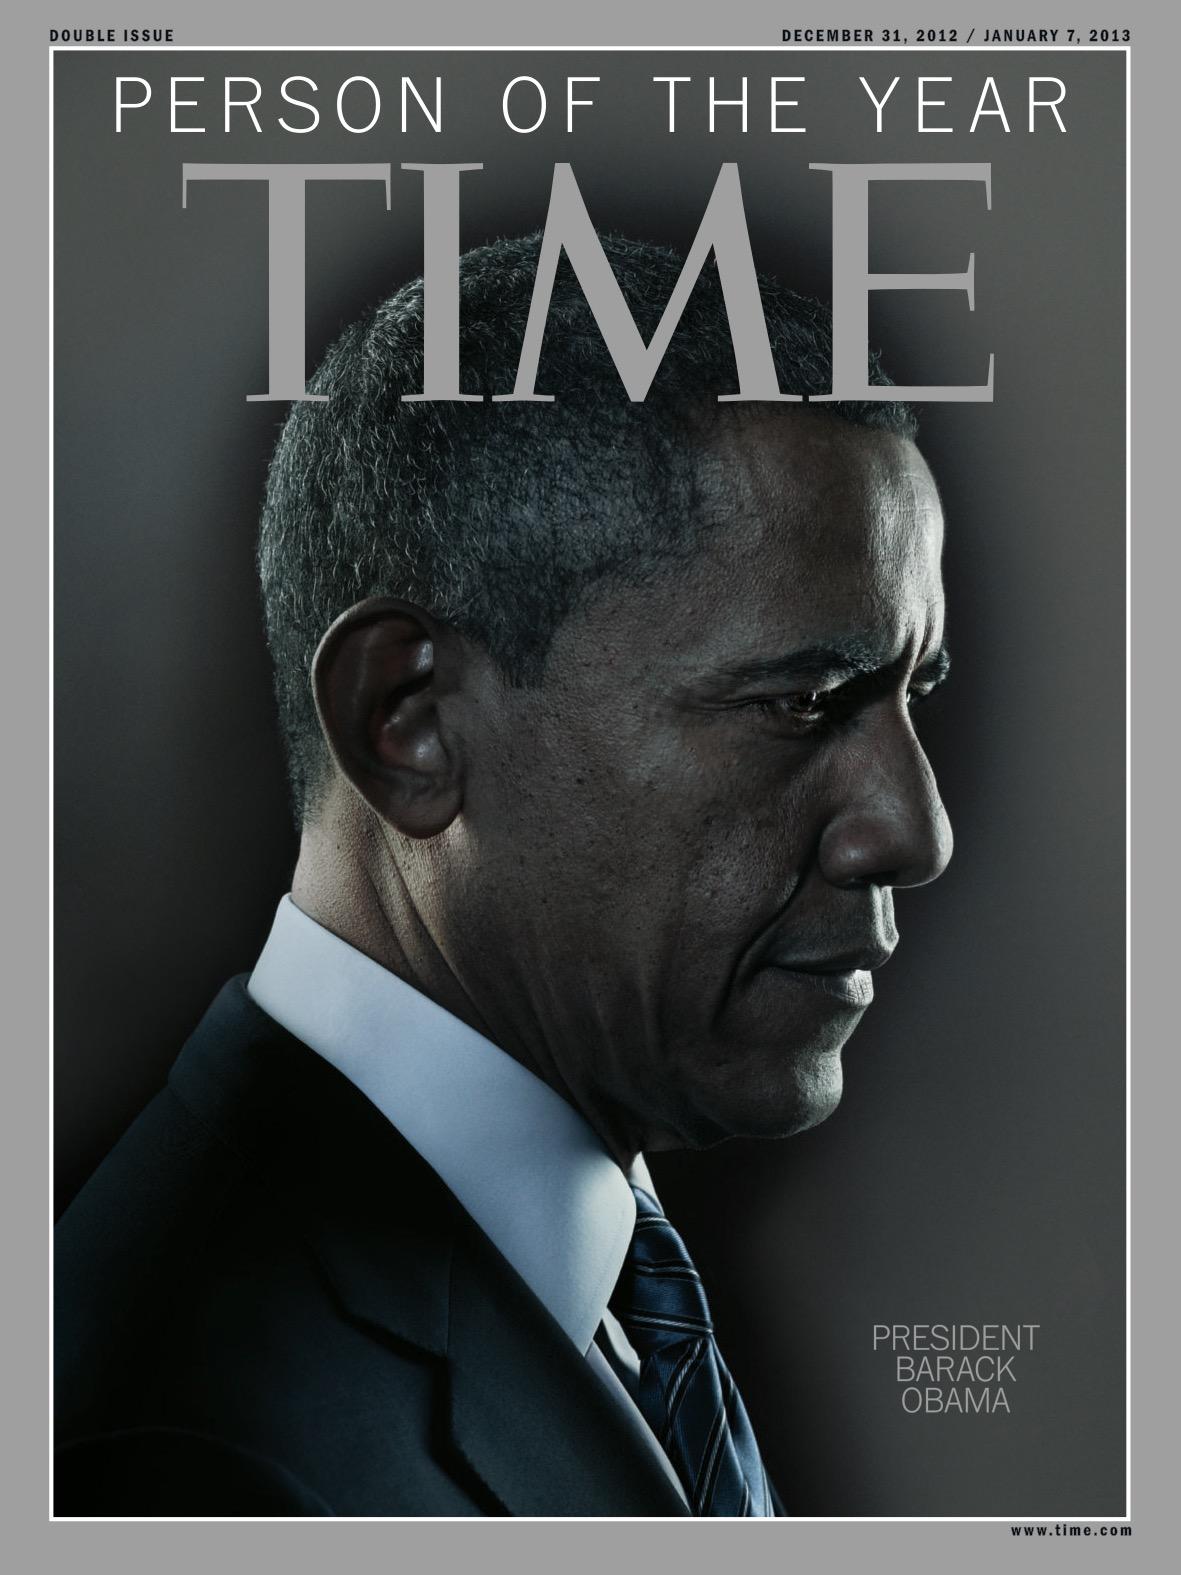 TIME_20121231_CV1_762964_C1.jpeg